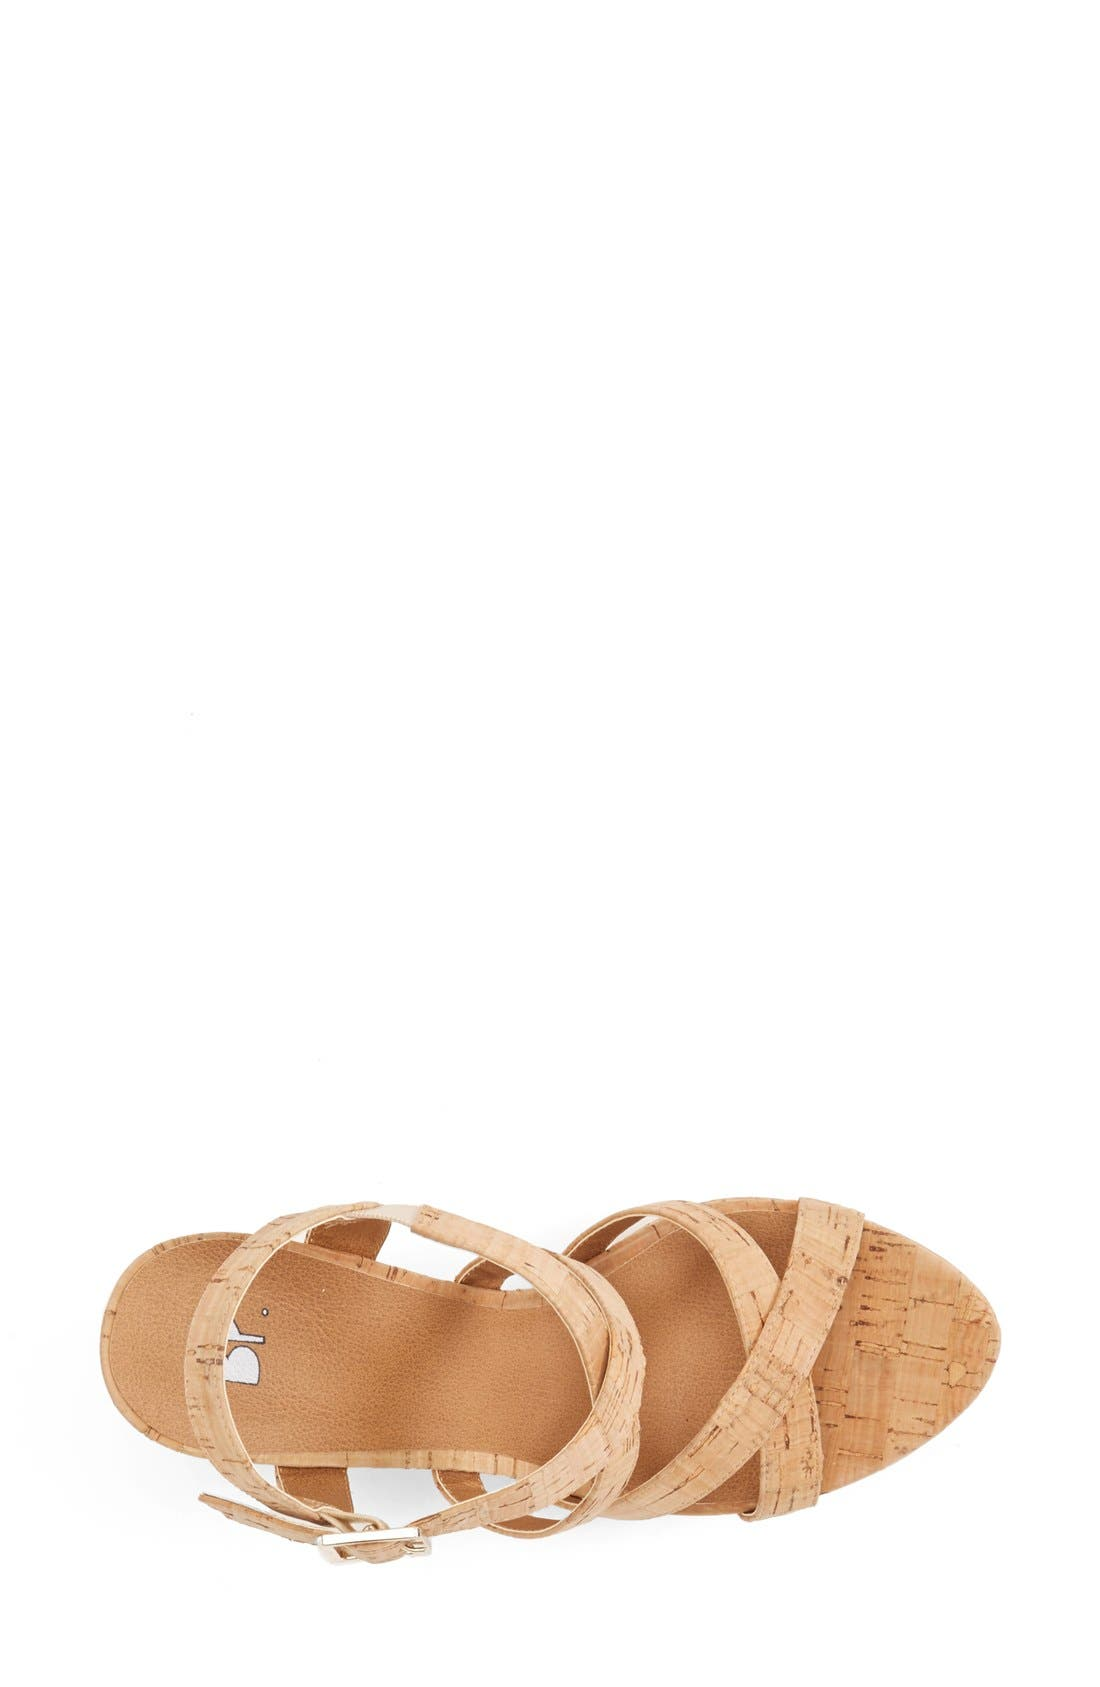 'Summers' Wedge Sandal,                             Alternate thumbnail 10, color,